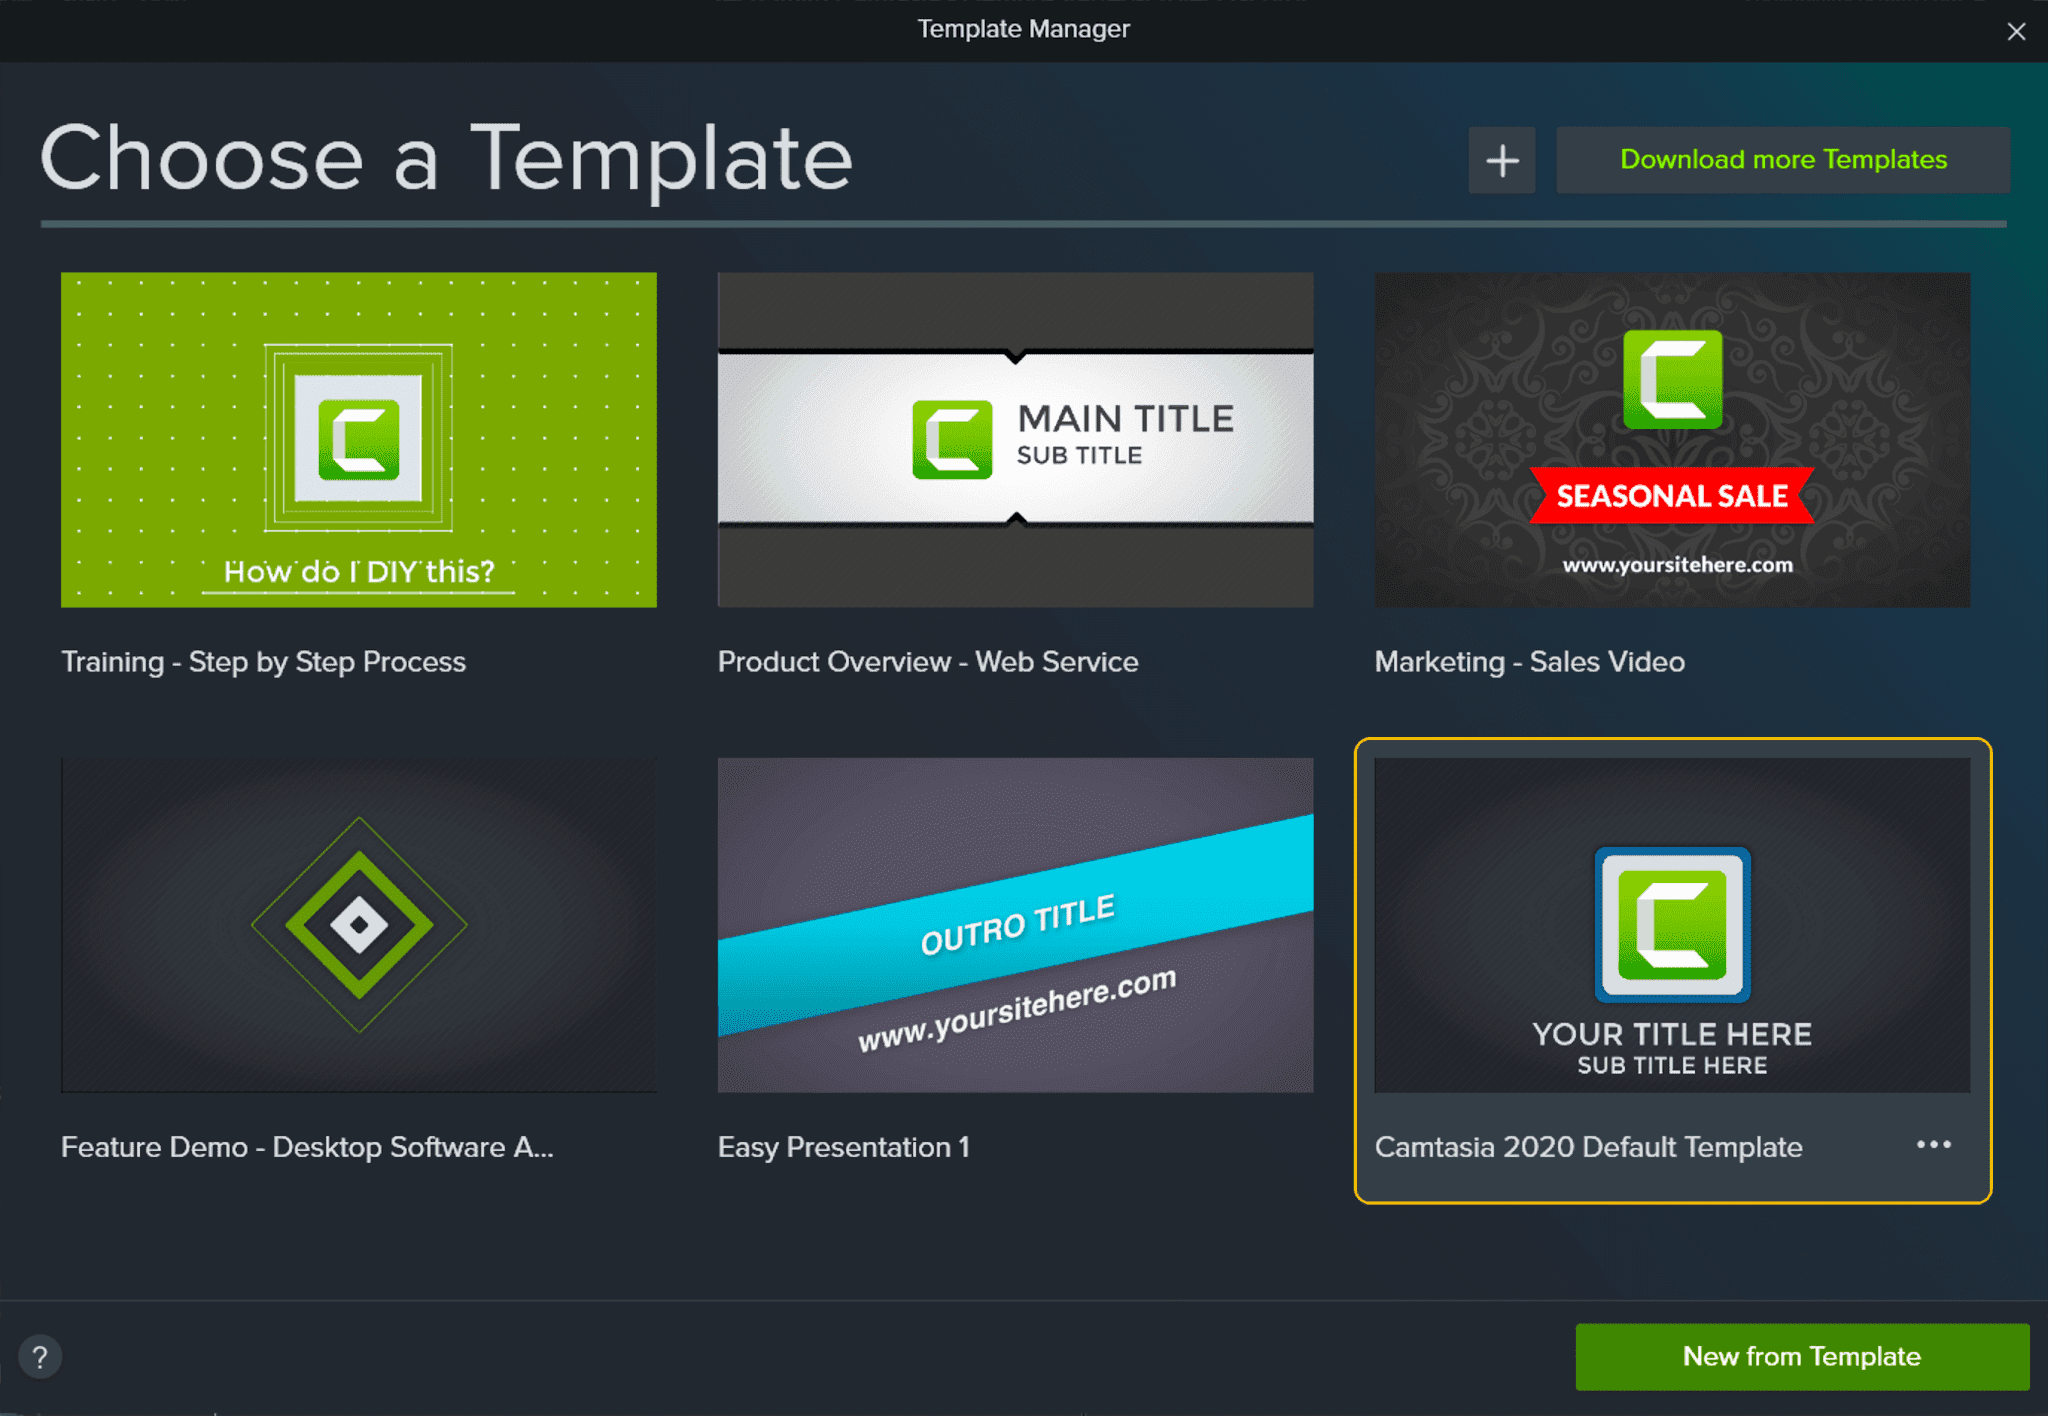 Camtasia Template Manager Screenshot